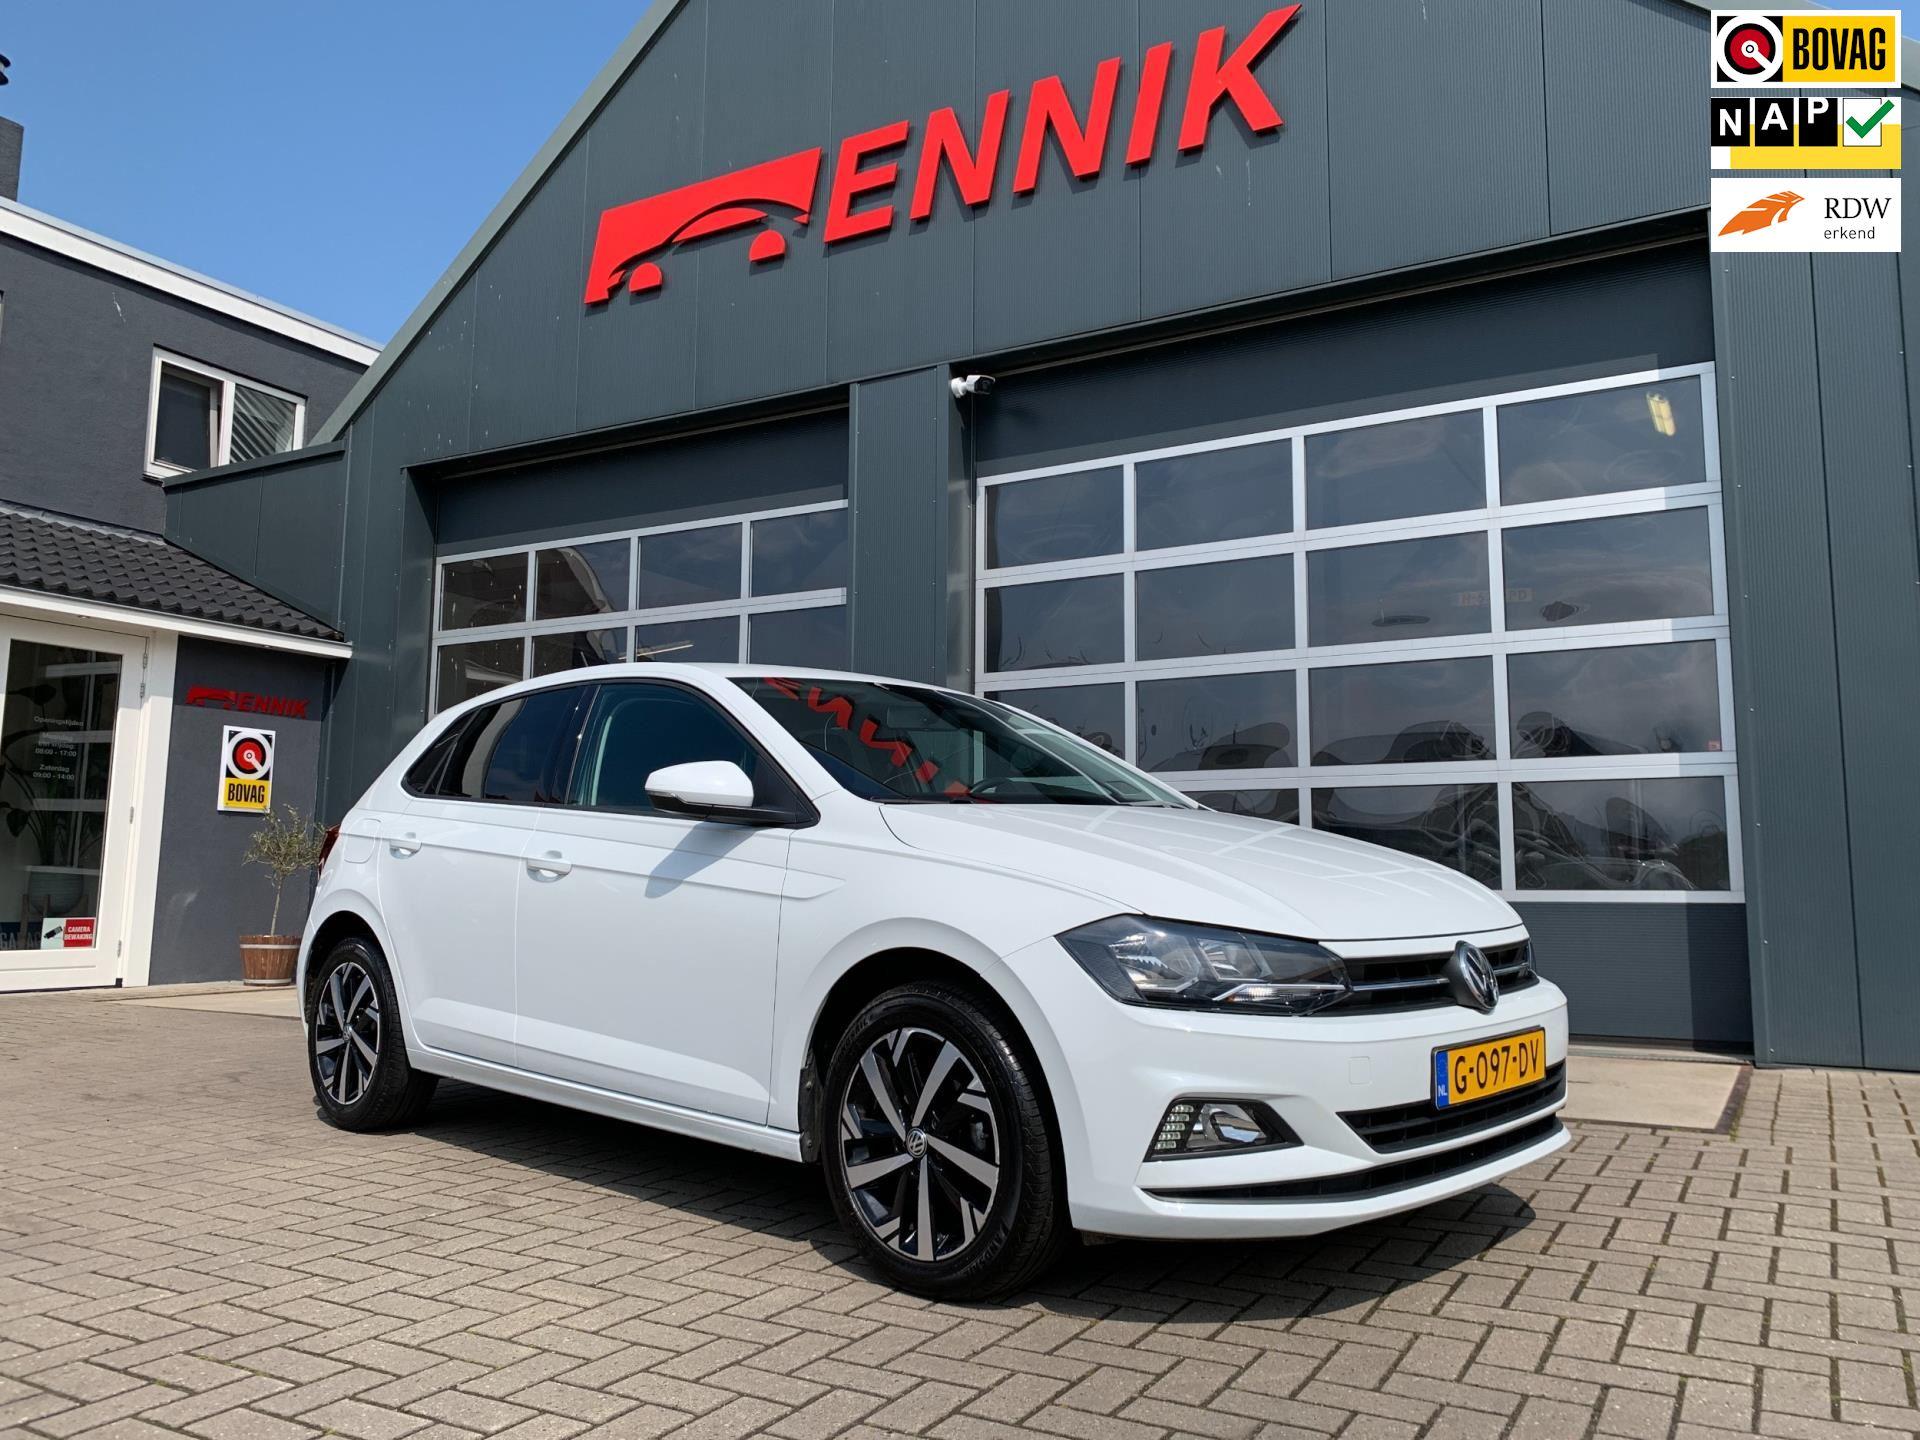 Volkswagen Polo occasion - Ennik Autobedrijf